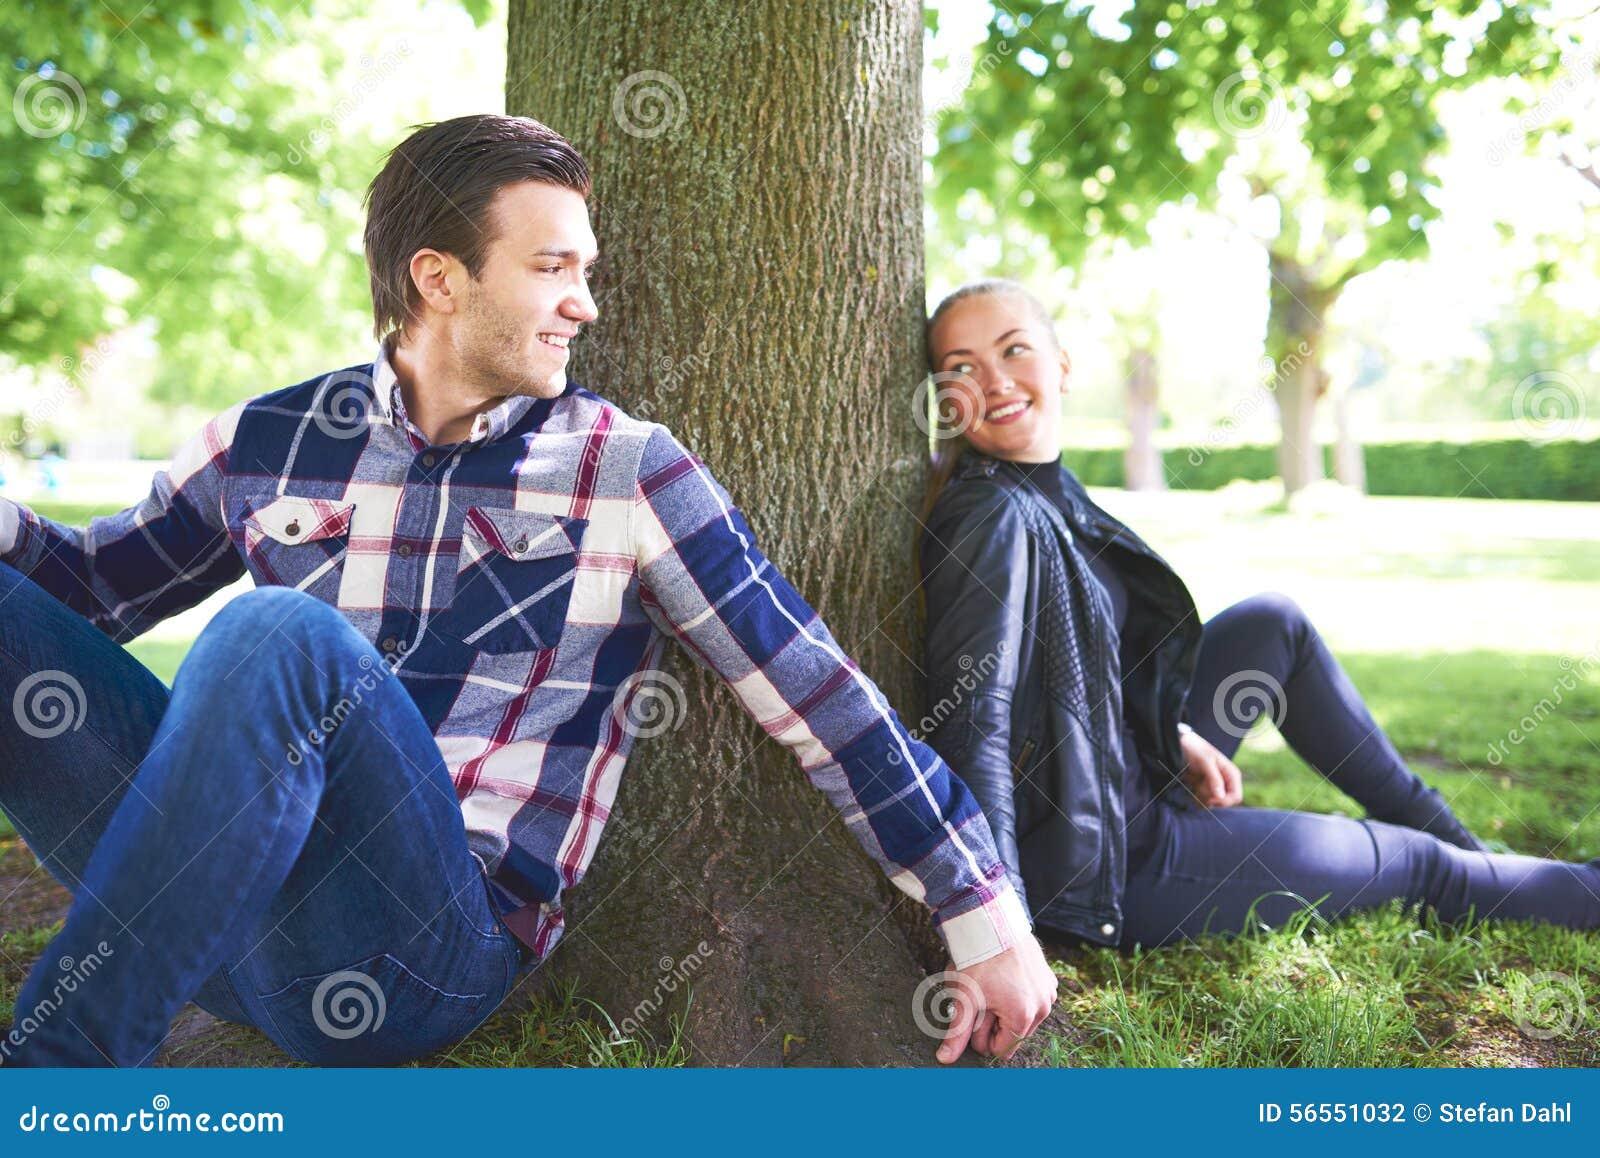 Download Γλυκοί εραστές που χαλαρώνουν κάτω από τη σκιά ενός δέντρου Στοκ Εικόνες - εικόνα από ευτυχής, φύση: 56551032